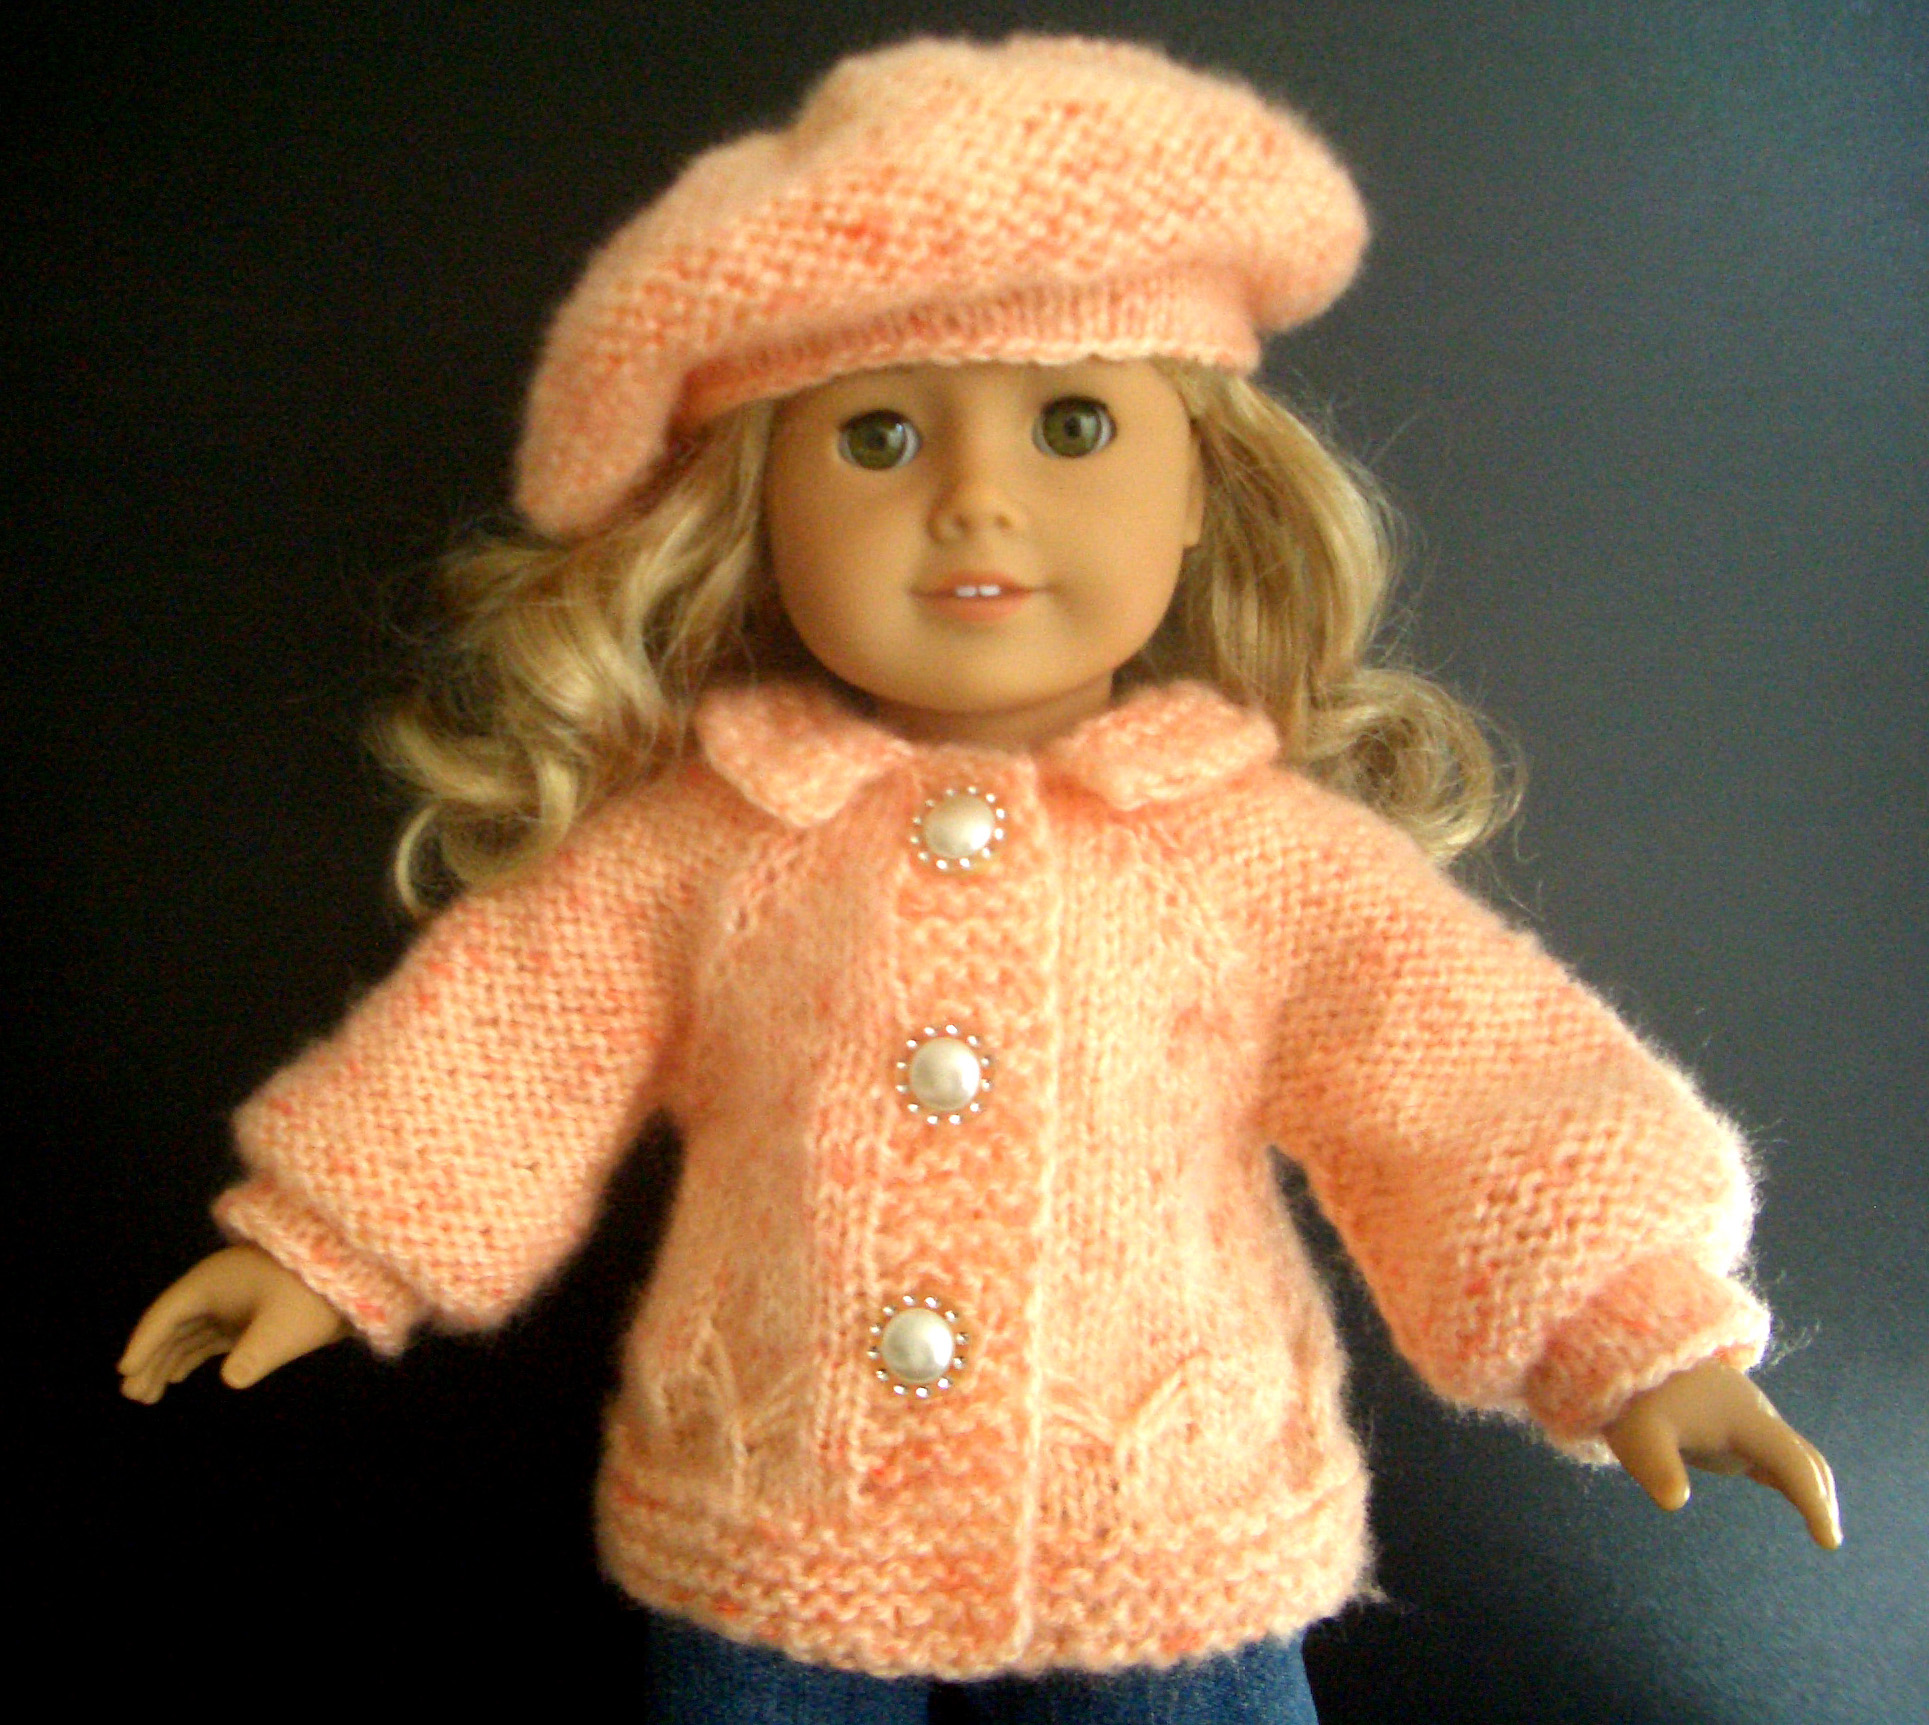 Peachy Butterflies Sweater Set Knitting Pattern (033) - Knit N Play